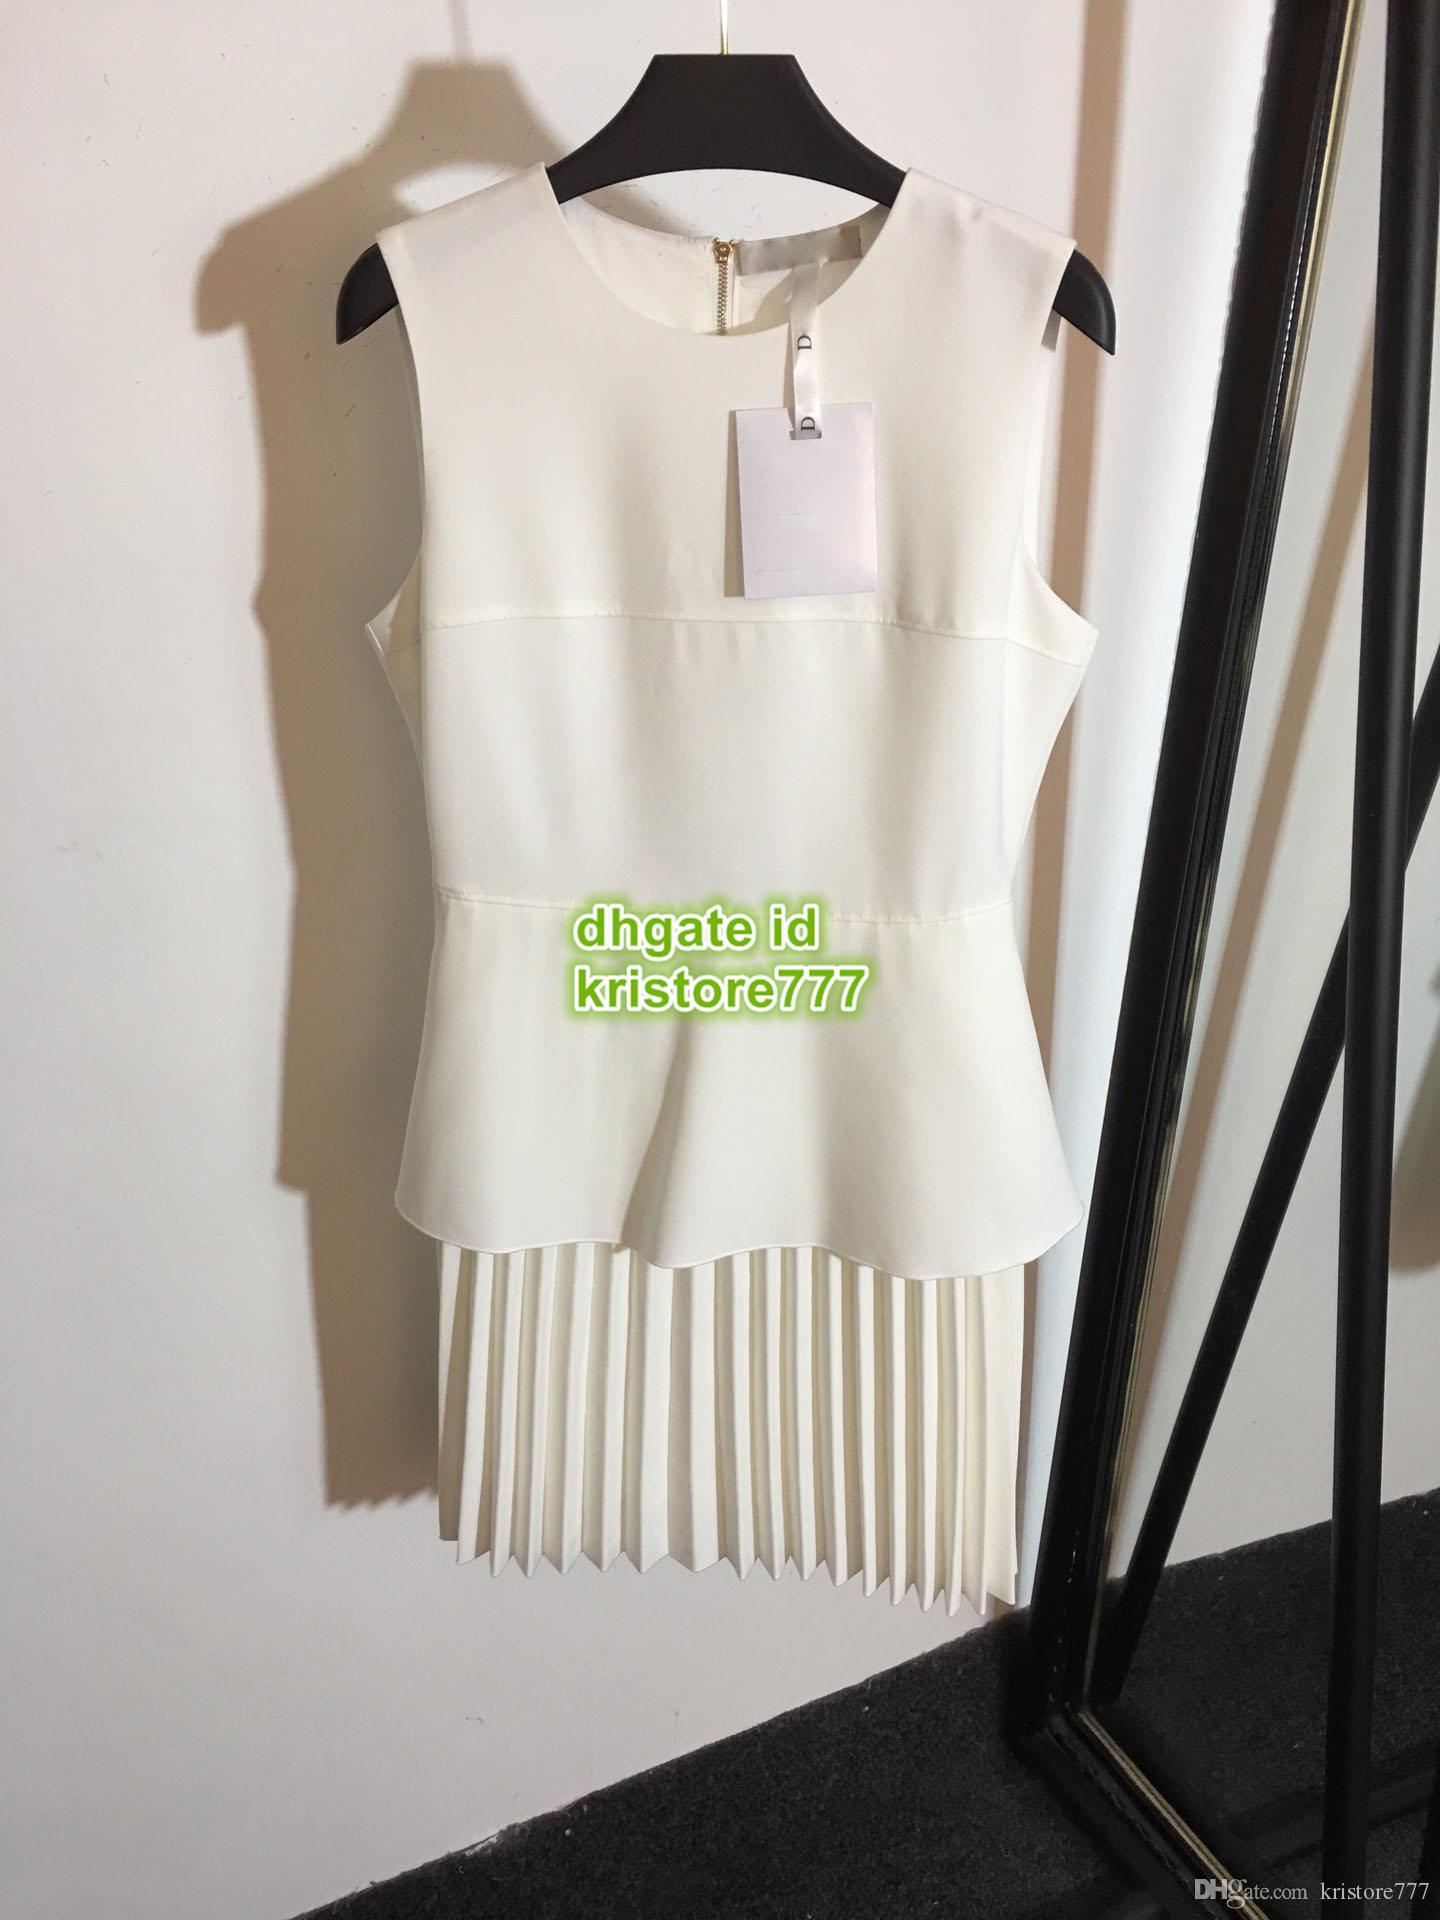 6b79047851e29 2019 Women Panelled Blazer Dress Crew Neck The High-End Custom Mini Above  Knee Shirt Pleated Dresses Summer S-M-L